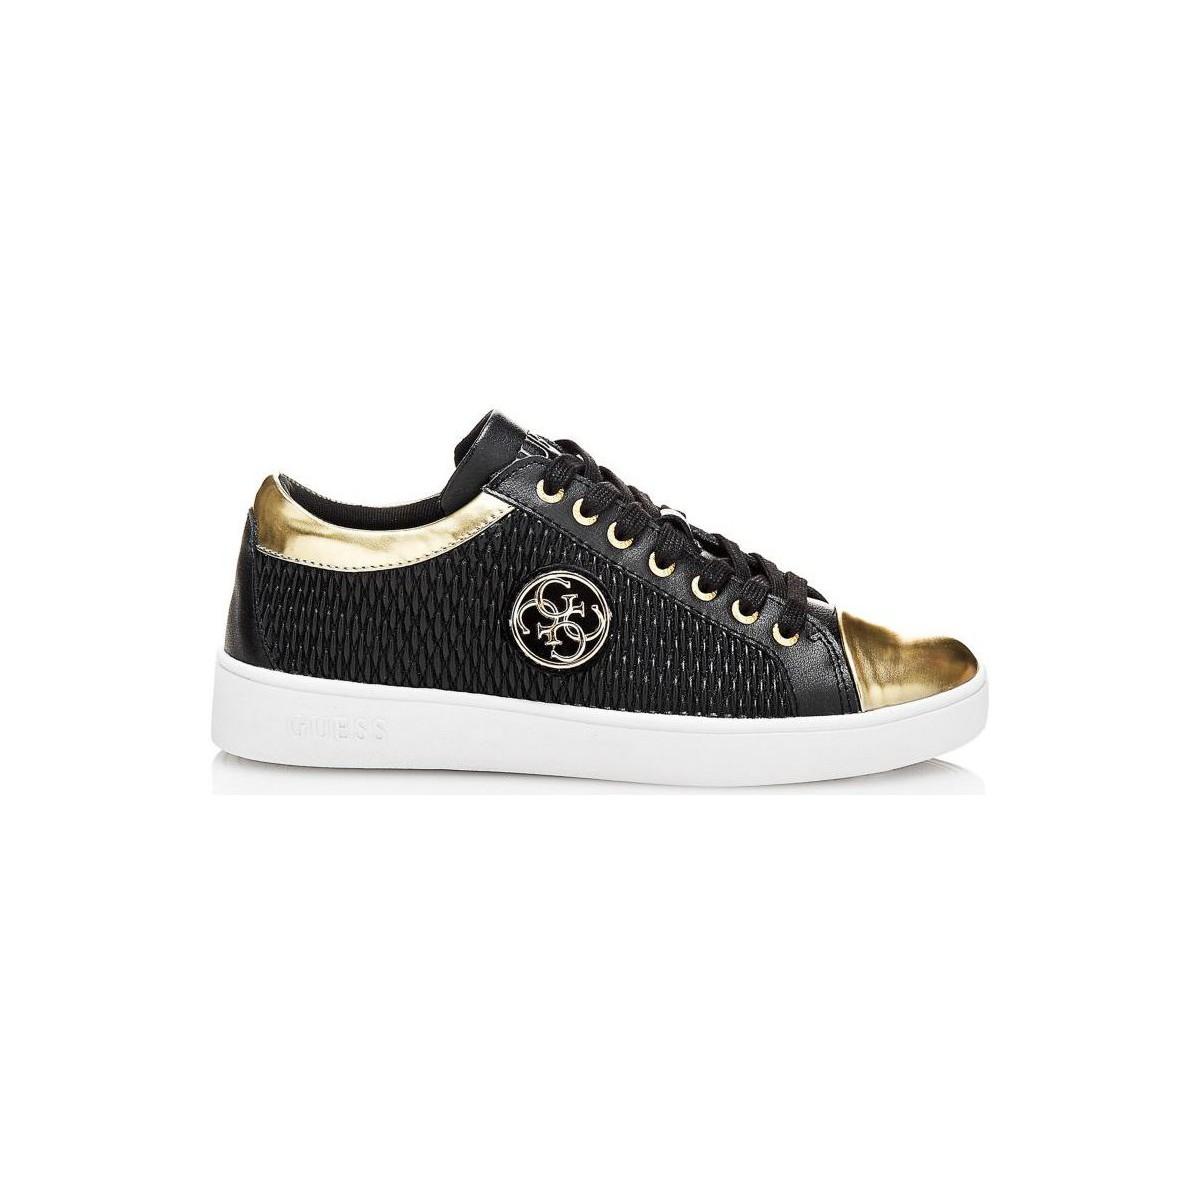 chaussures guess femme noir,chaussures guess en promo